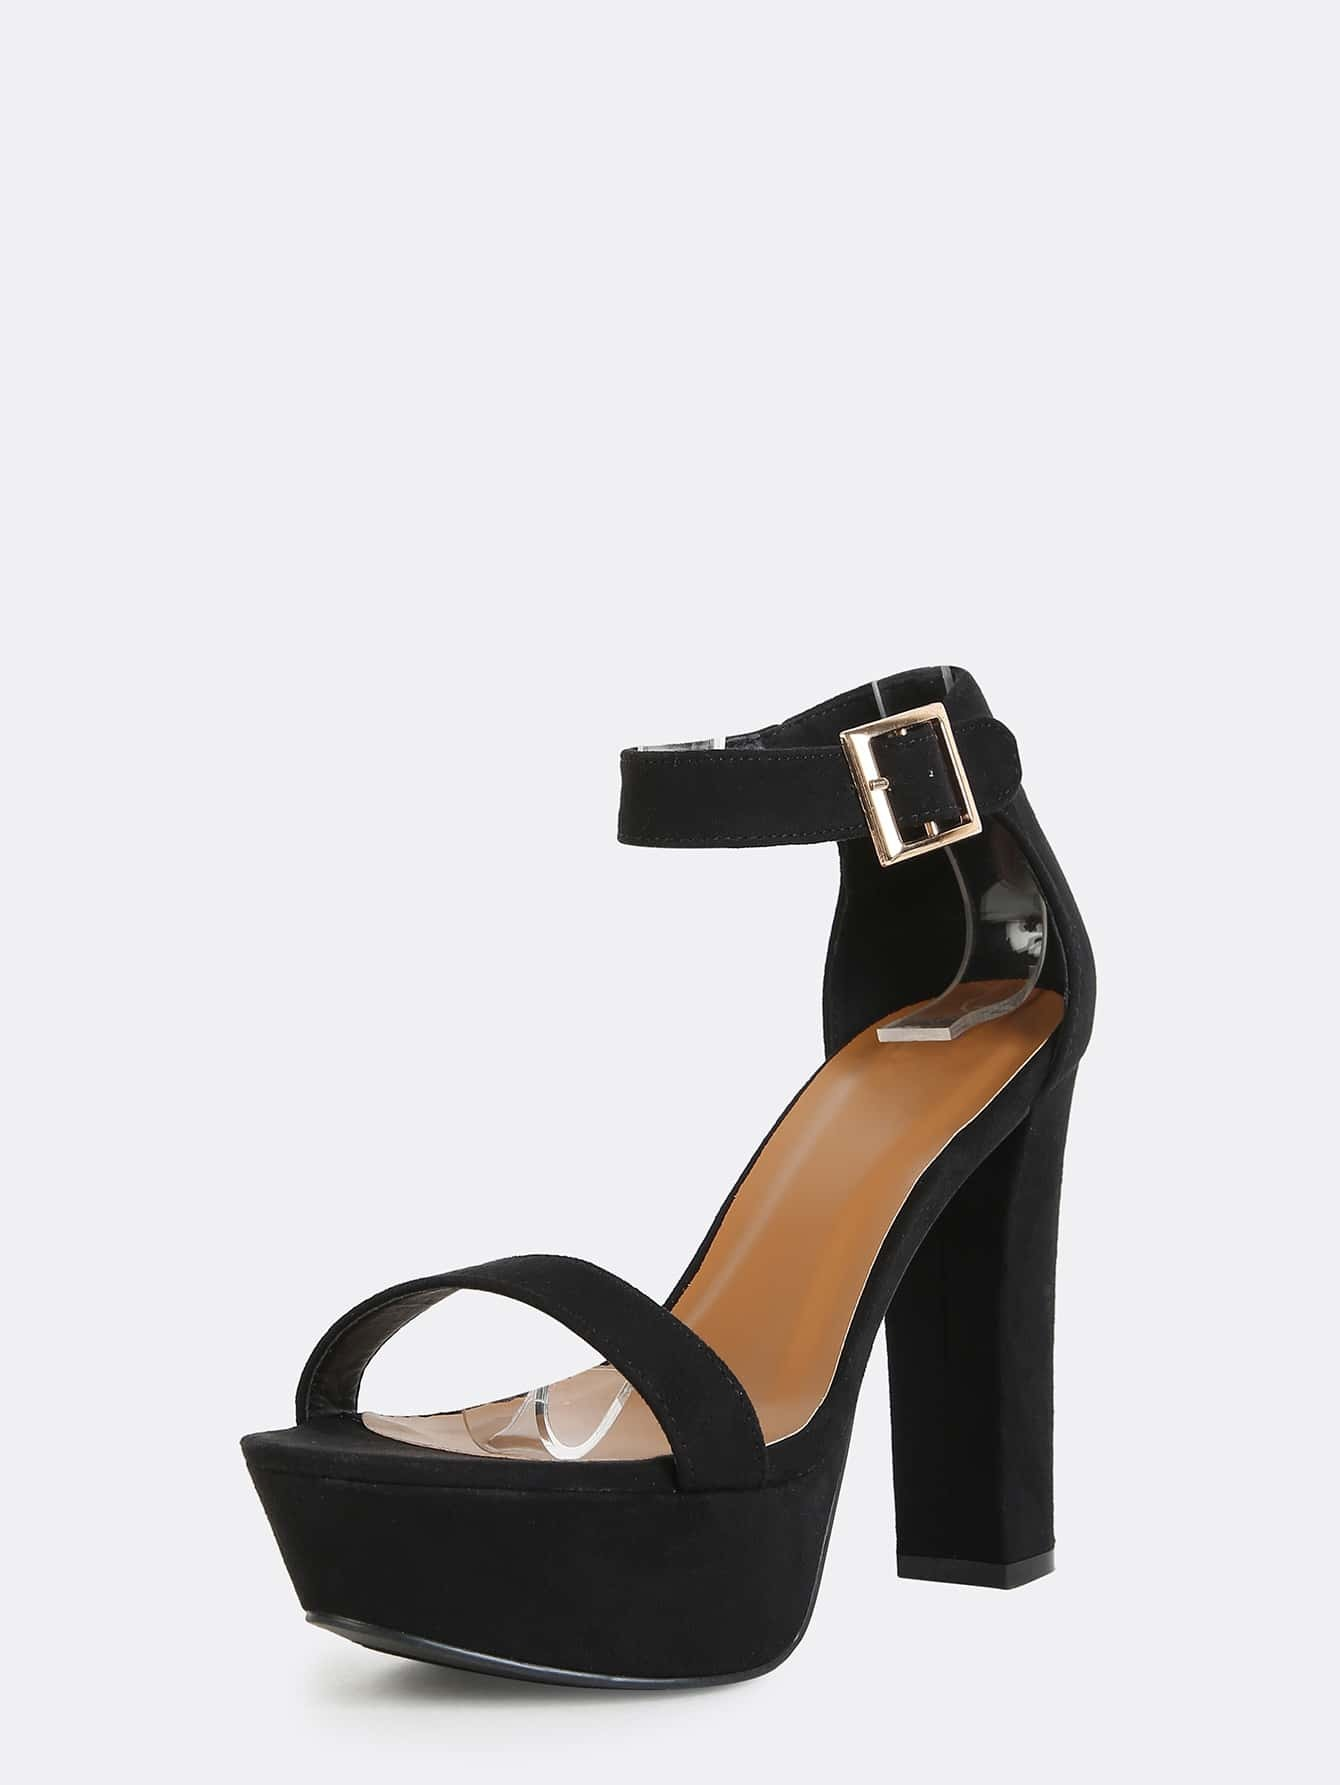 4c892aab1f6 Black Platform Heels With Ankle Strap